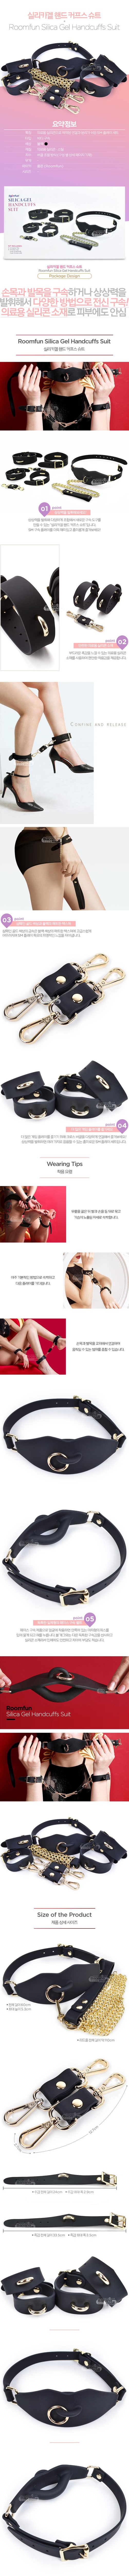 [SM 구속 세트] 실리카겔 핸드 커프스 슈트(Roomfun Silica Gel Handcuffs Suit) - 룸펀(ZW-041) (RMP)